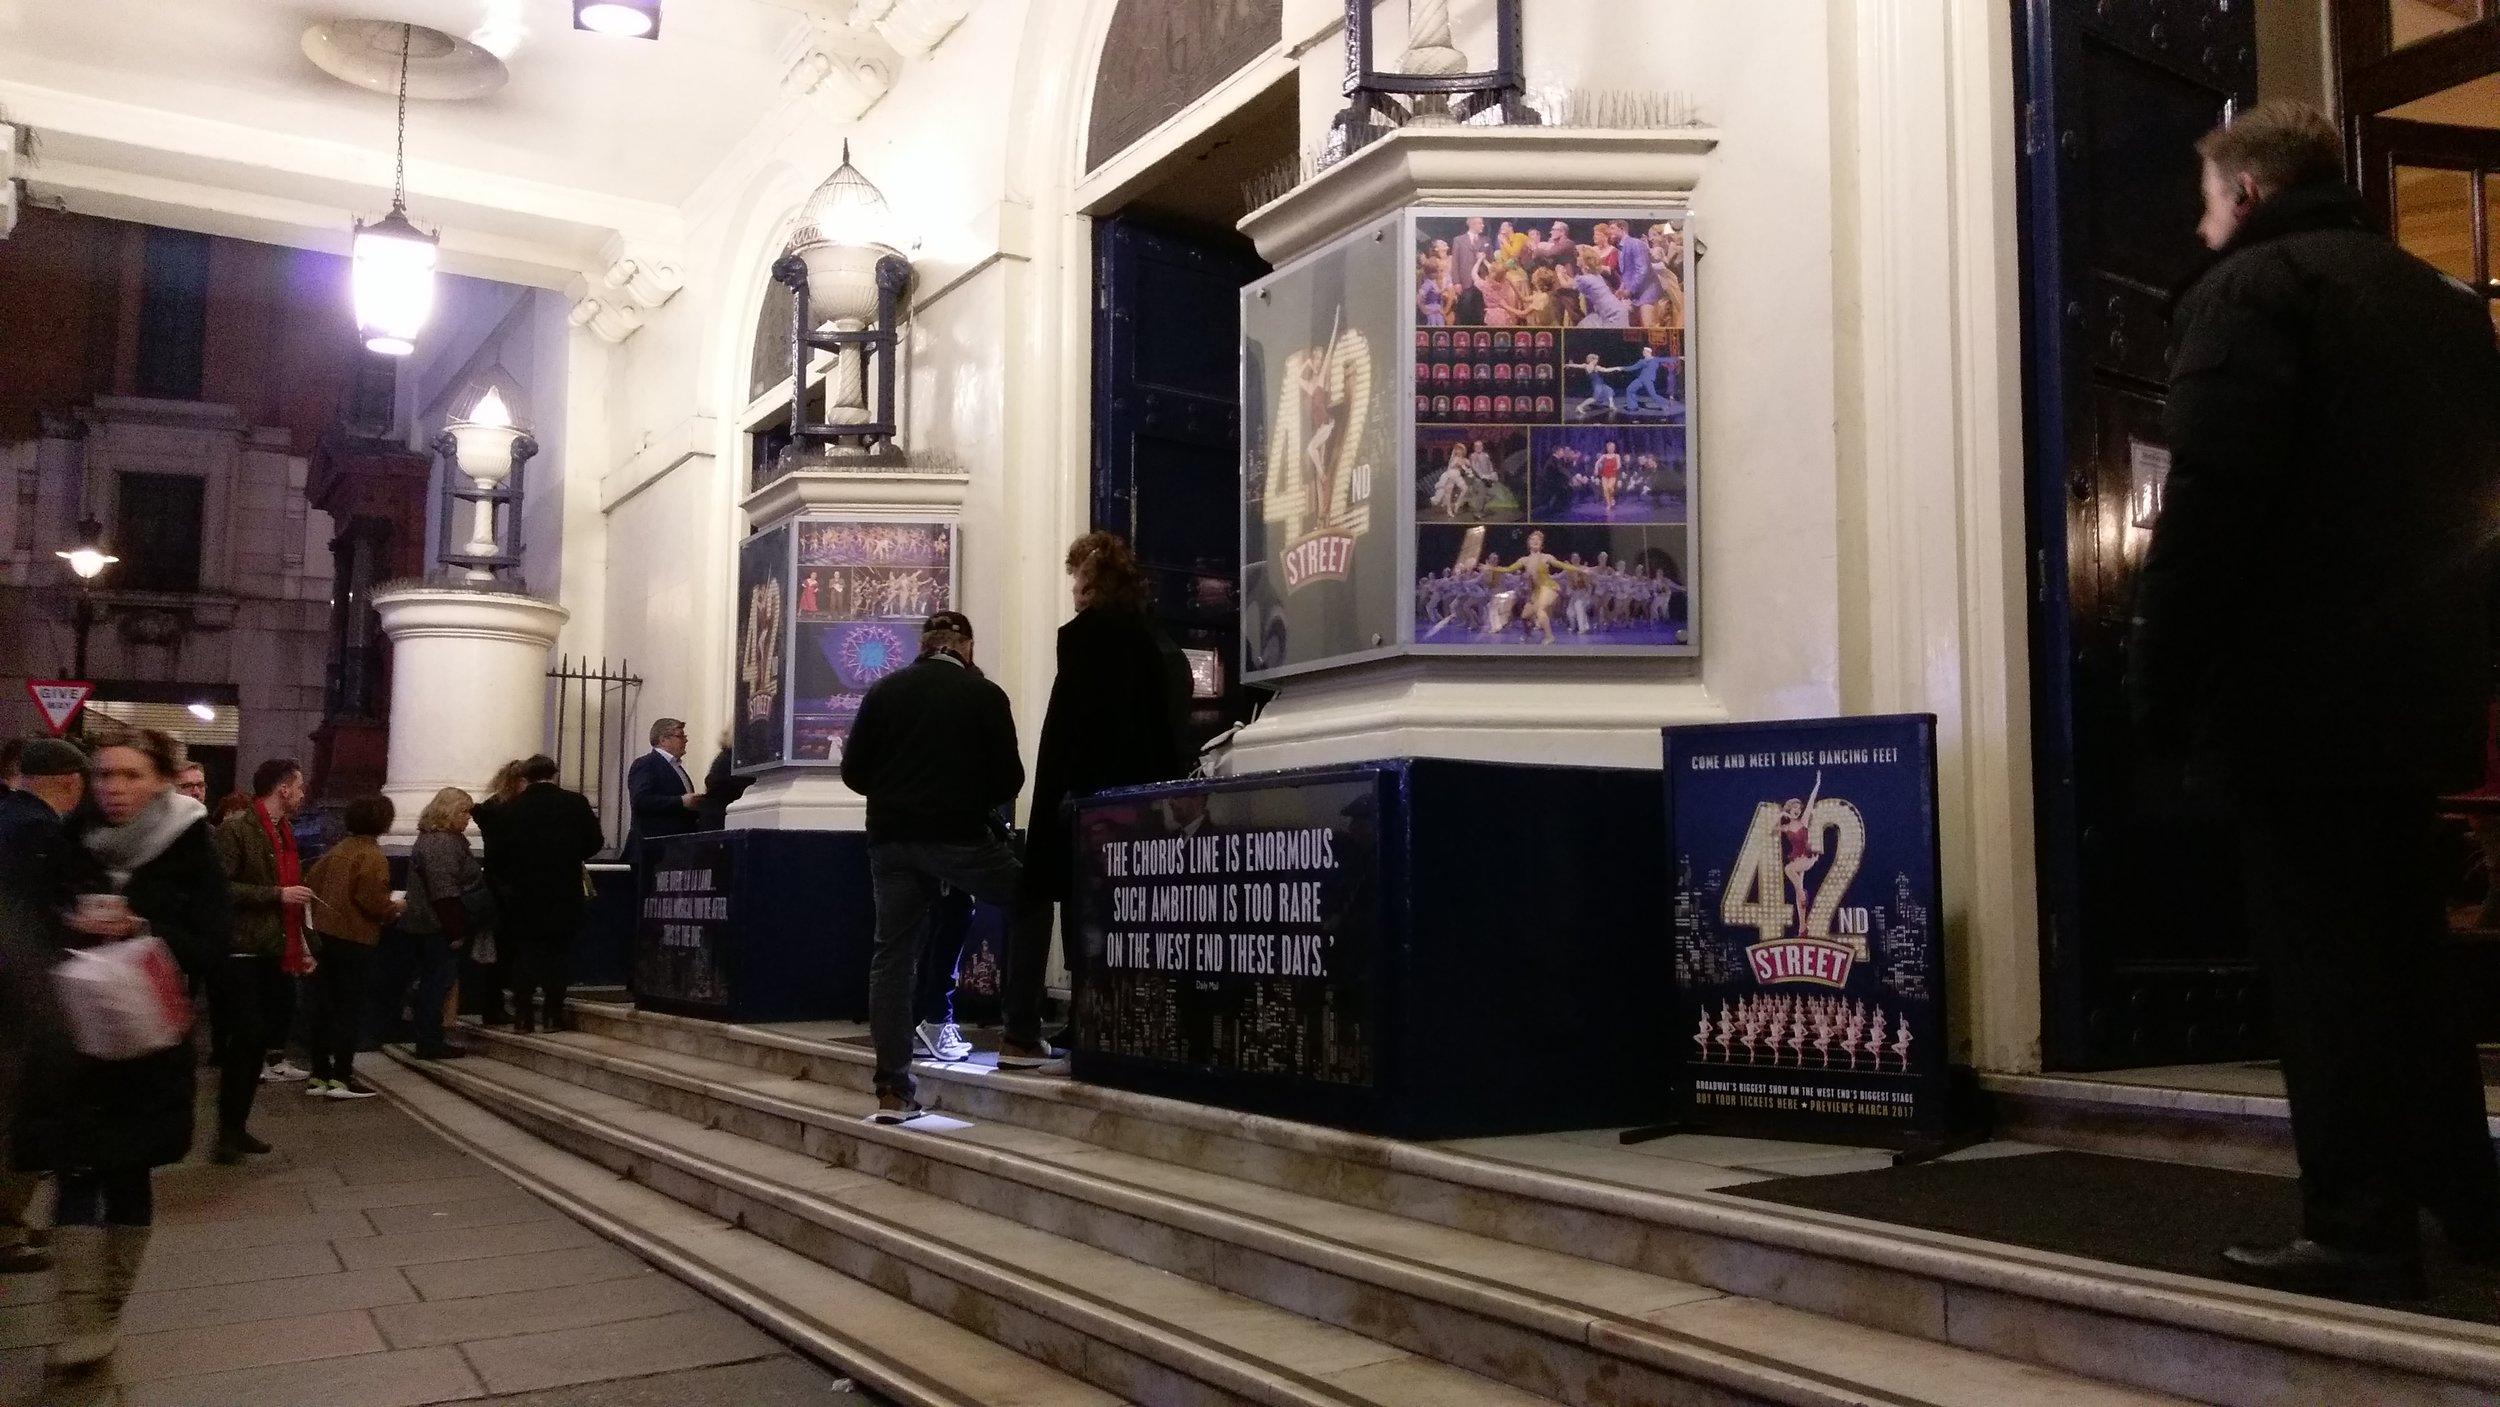 Theatre Royal Drury Lane - visited 02/01/2019